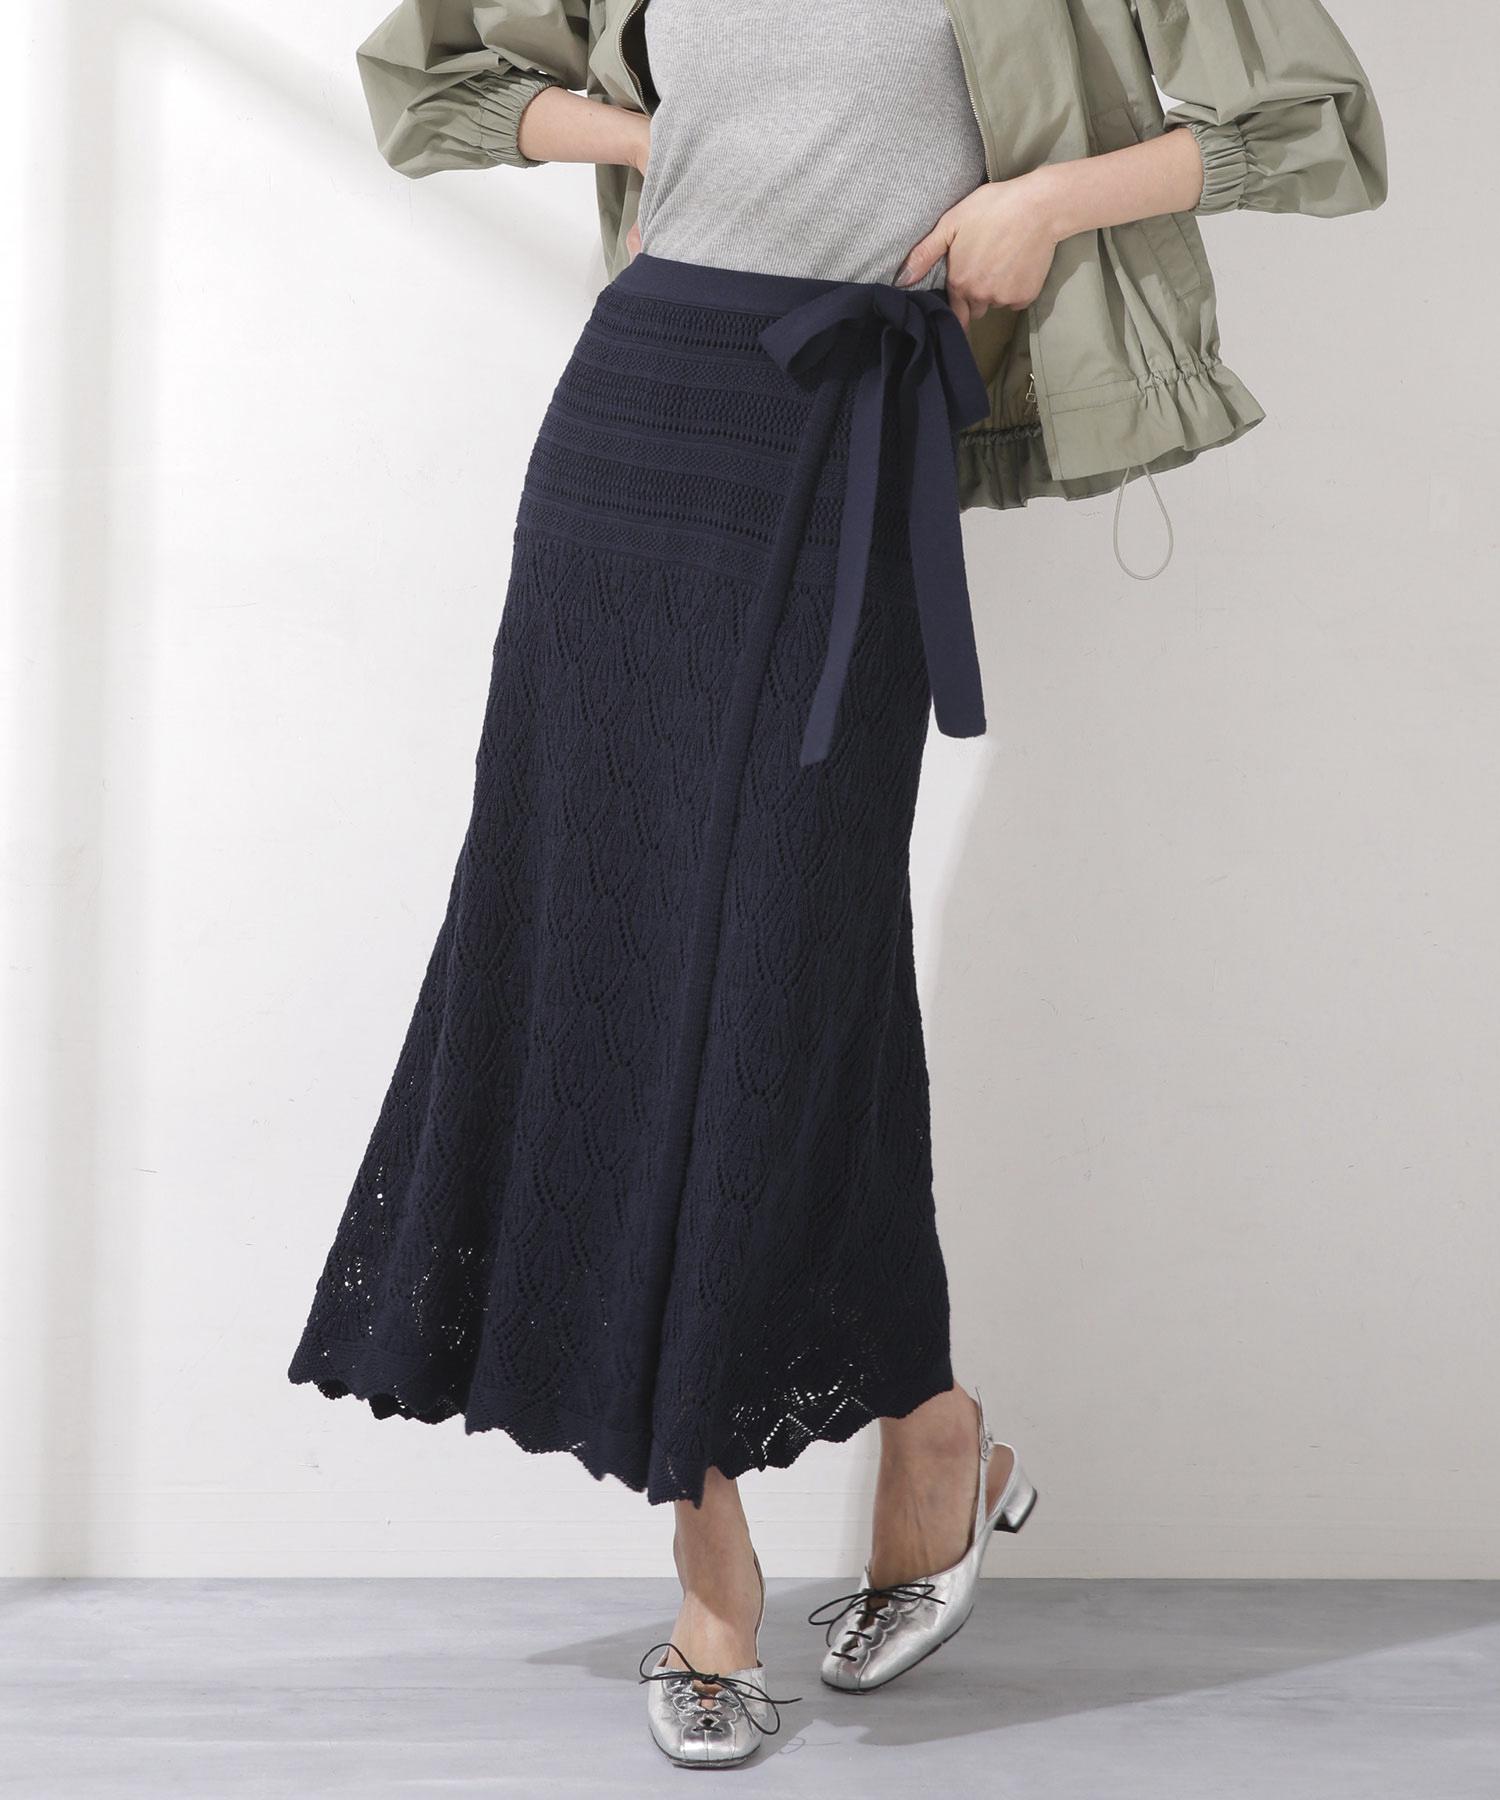 【Oggi 5月号掲載】クロシェレースラップスカート